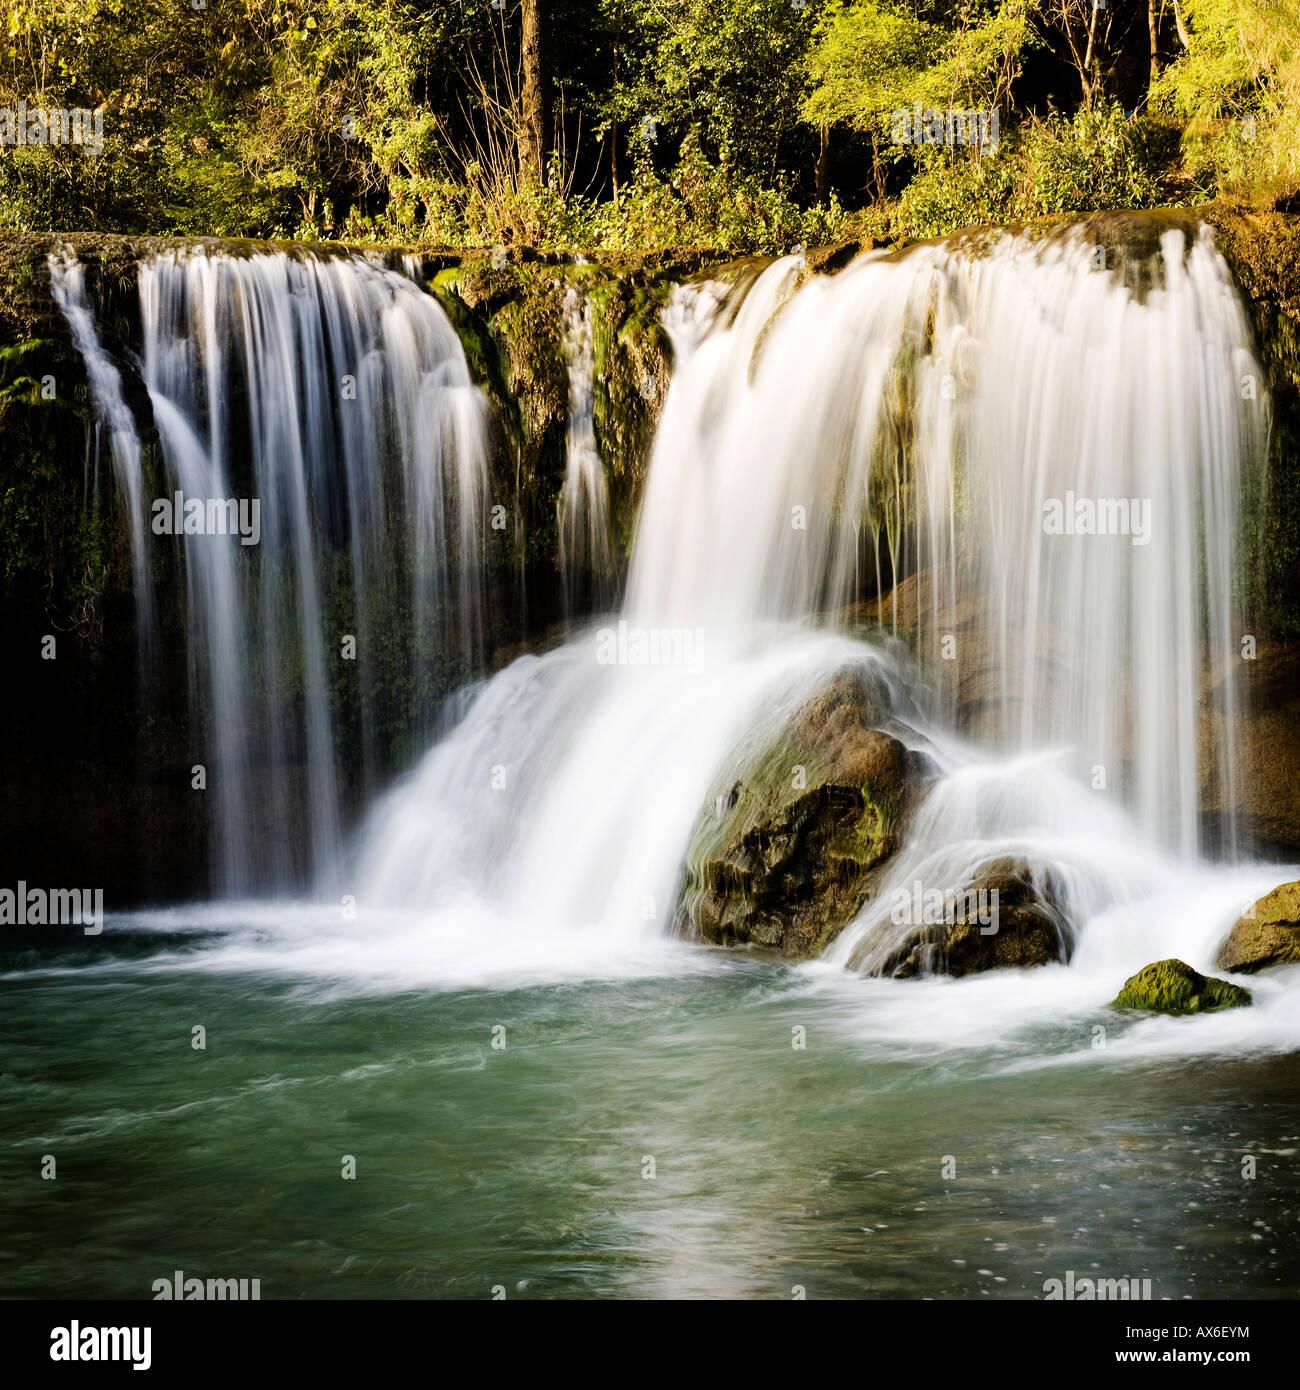 Lower cascades of Jiulong (Nine Dragons) waterfall Yunnan, China - Stock Image